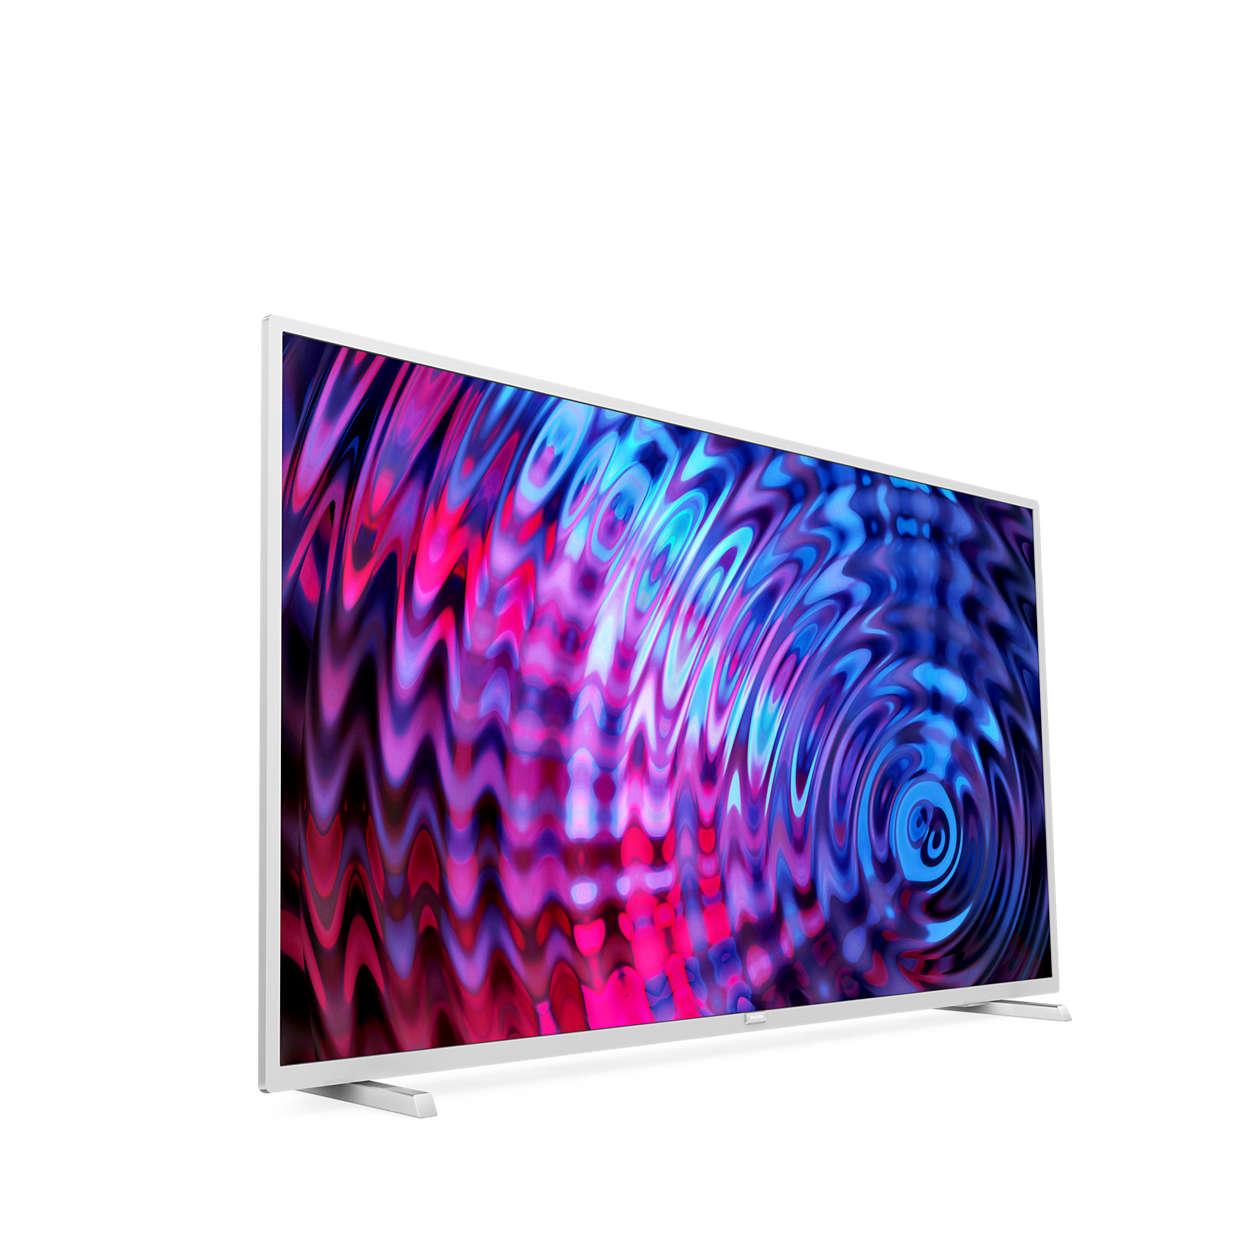 4c73f2ab9 Ultra tenký Smart LED televízor s rozlíšením Full HD 32PFS5823/12 ...